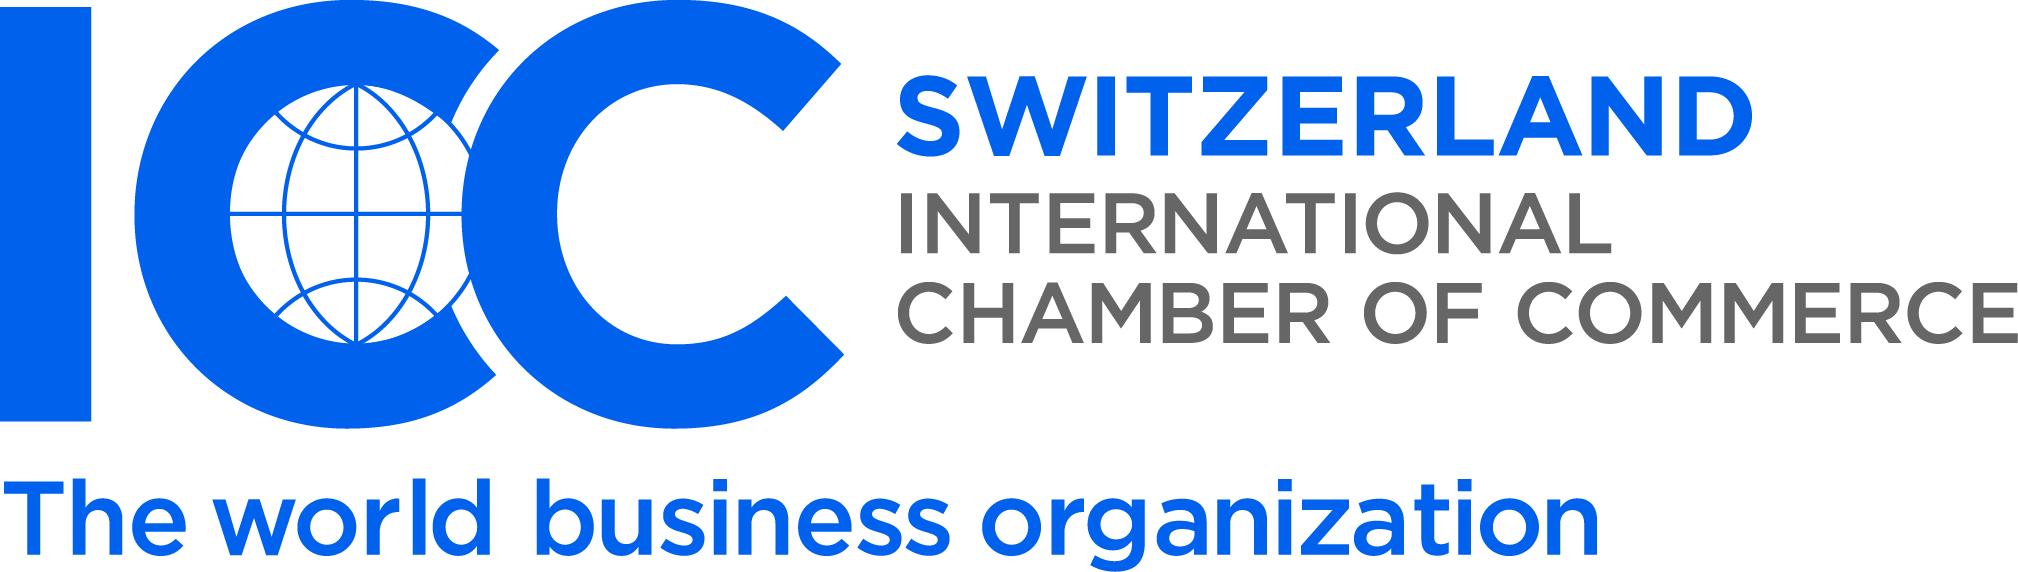 ICC NC WBO Horz logo_CH